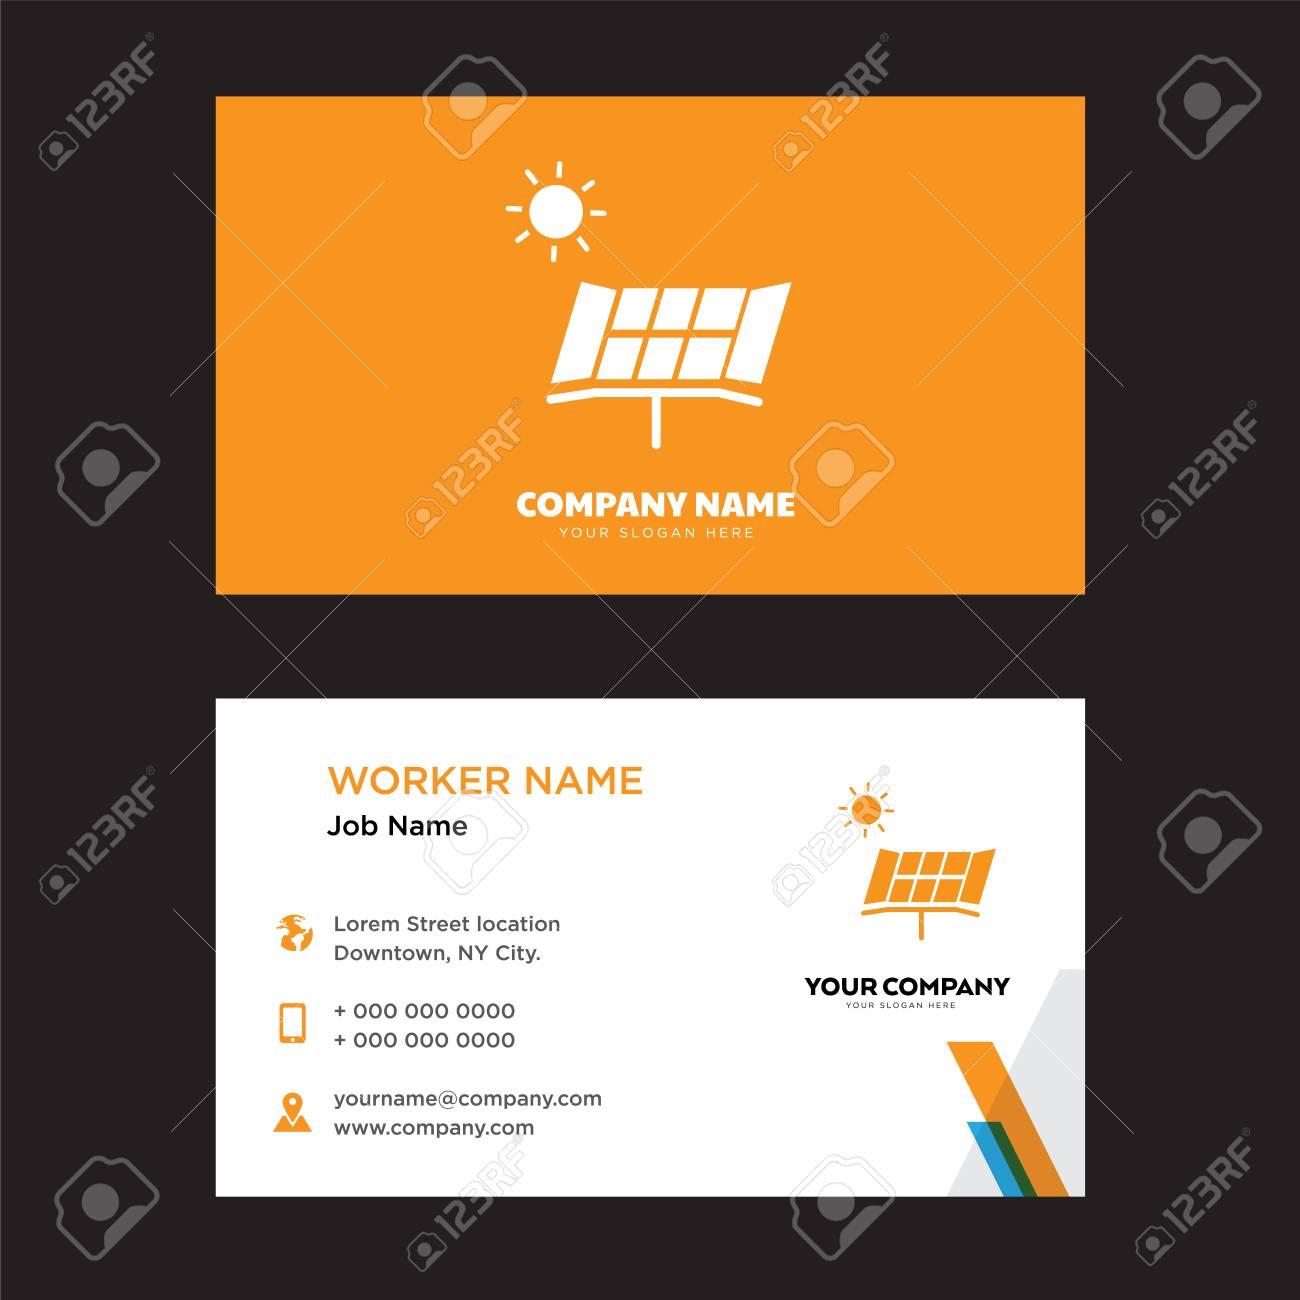 Solar battery business card design template visiting for your solar battery business card design template visiting for your company modern horizontal identity card colourmoves